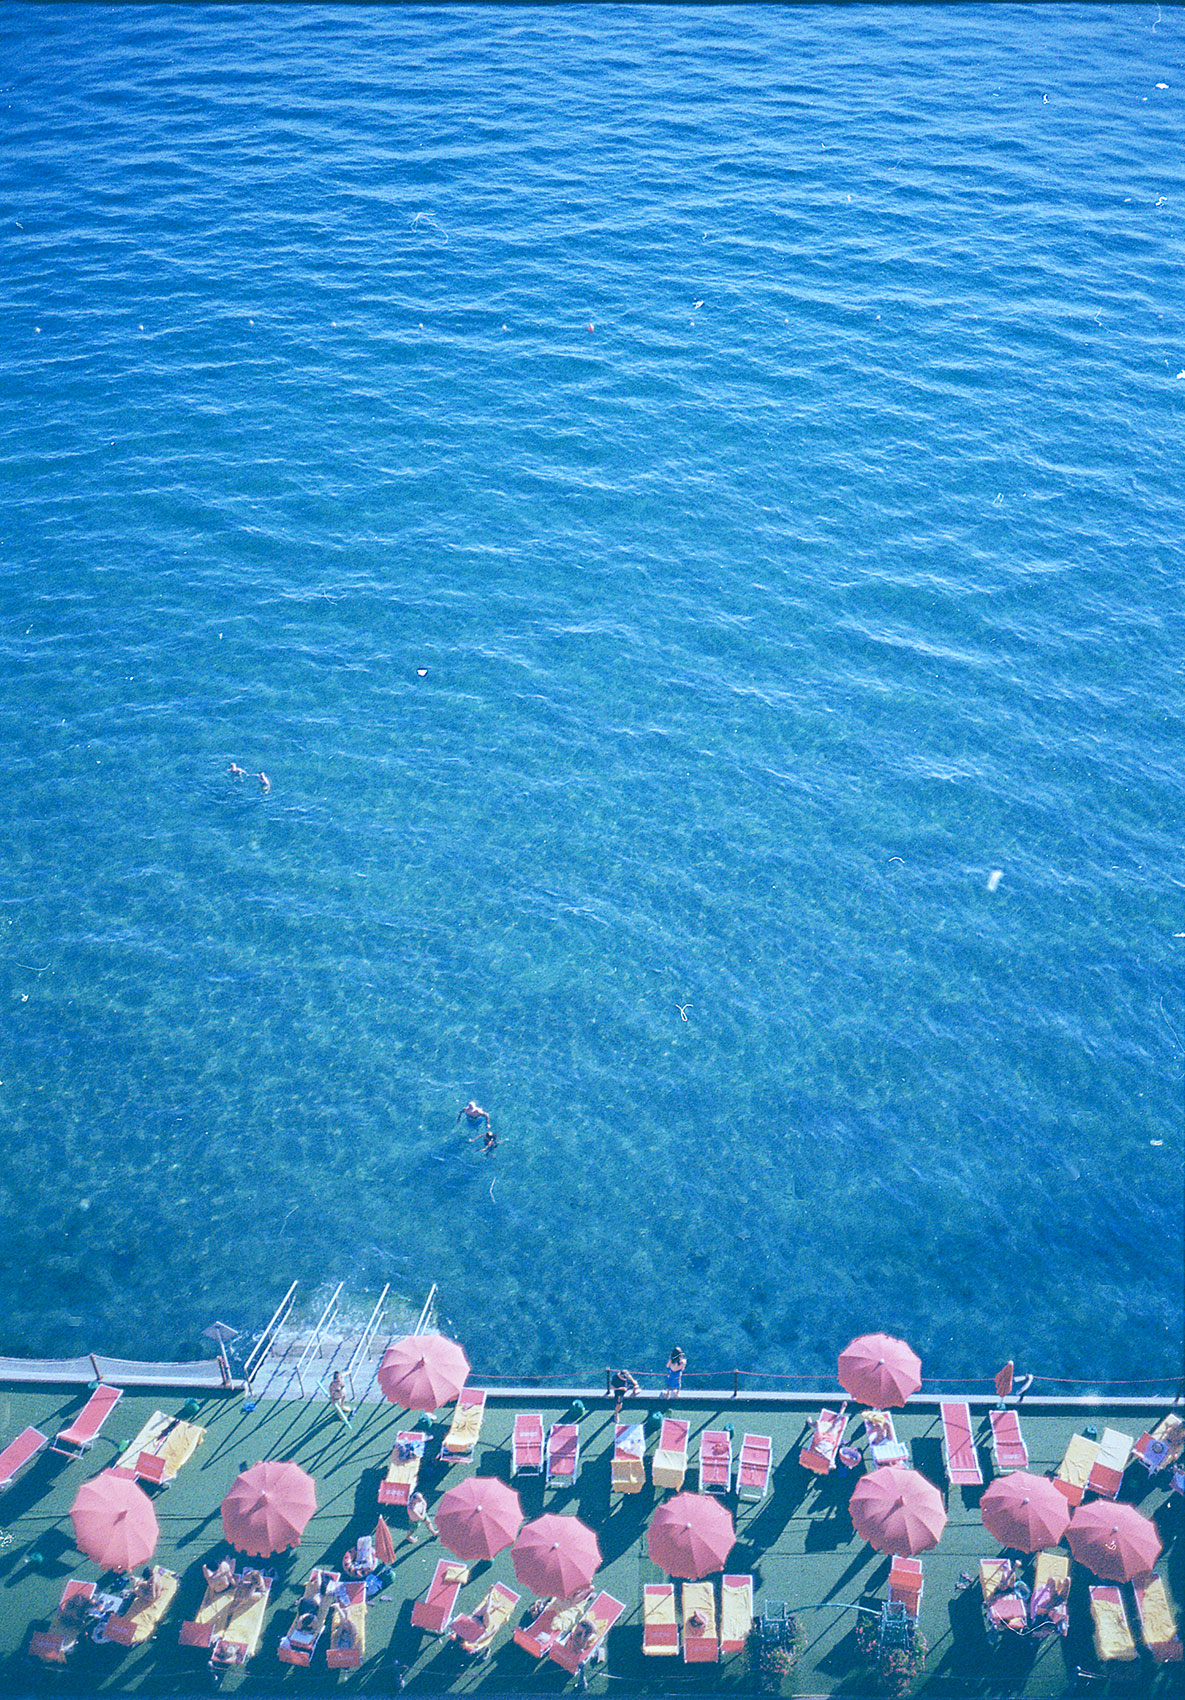 Top Sea - Analogue Renaissance   Stefano Paradiso - Photographer